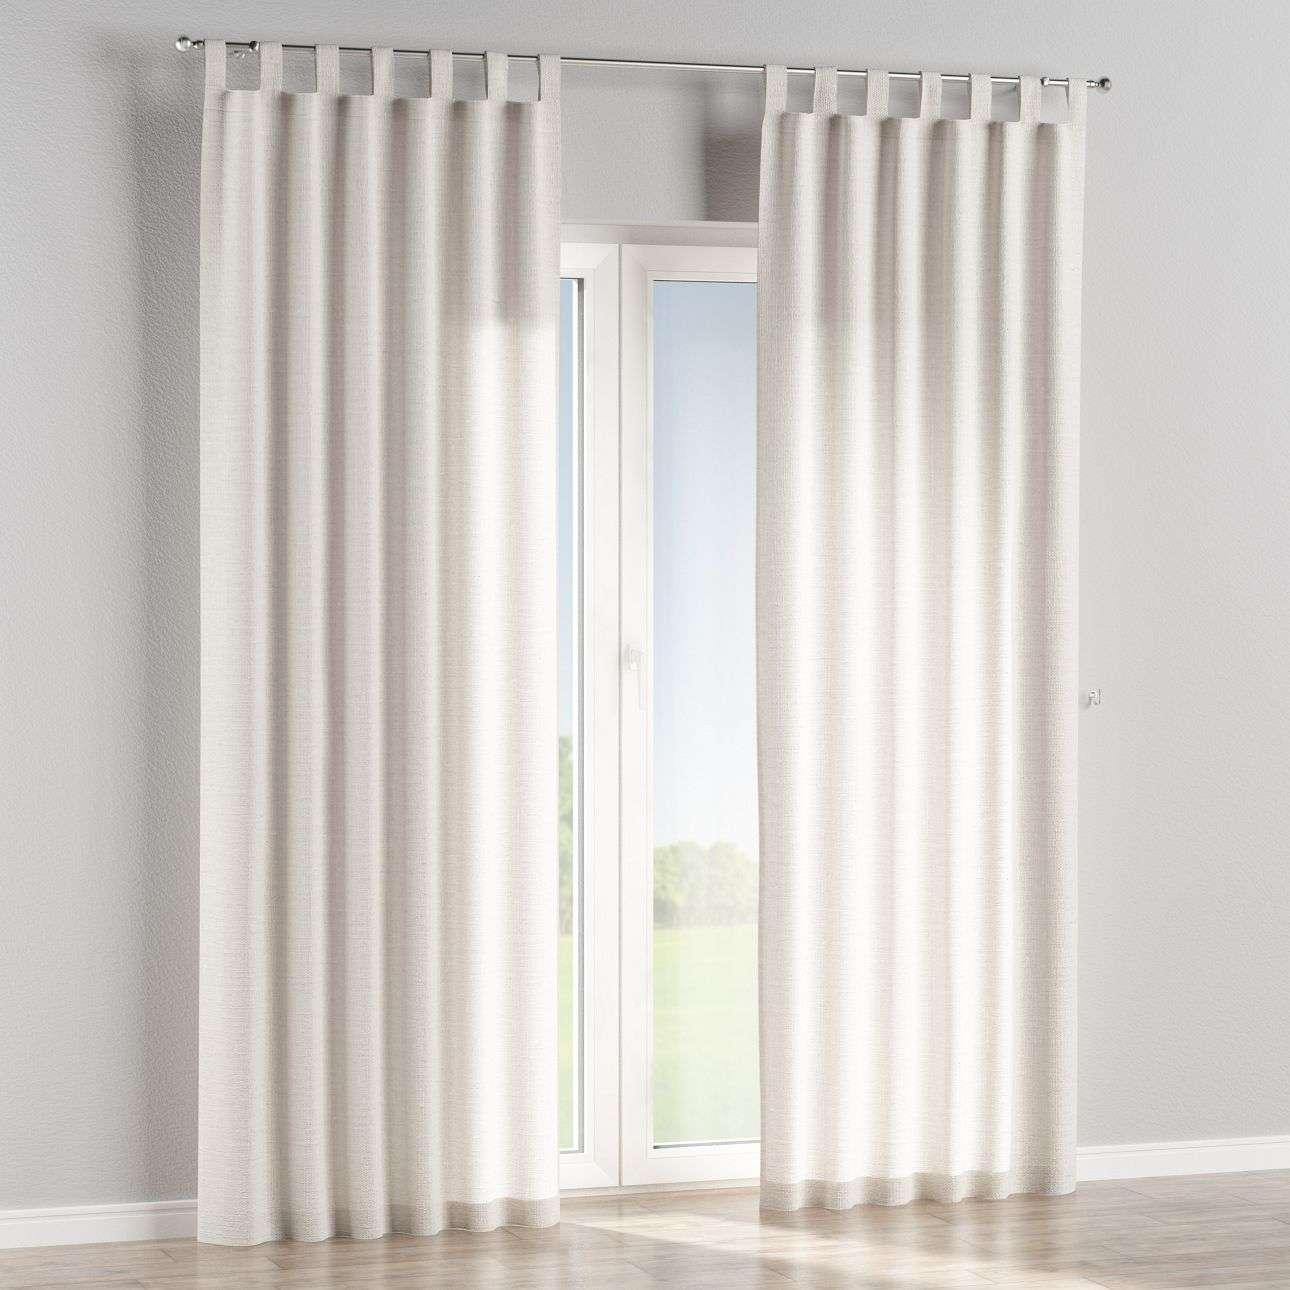 Záves na pútkach V kolekcii Linen, tkanina: 392-04